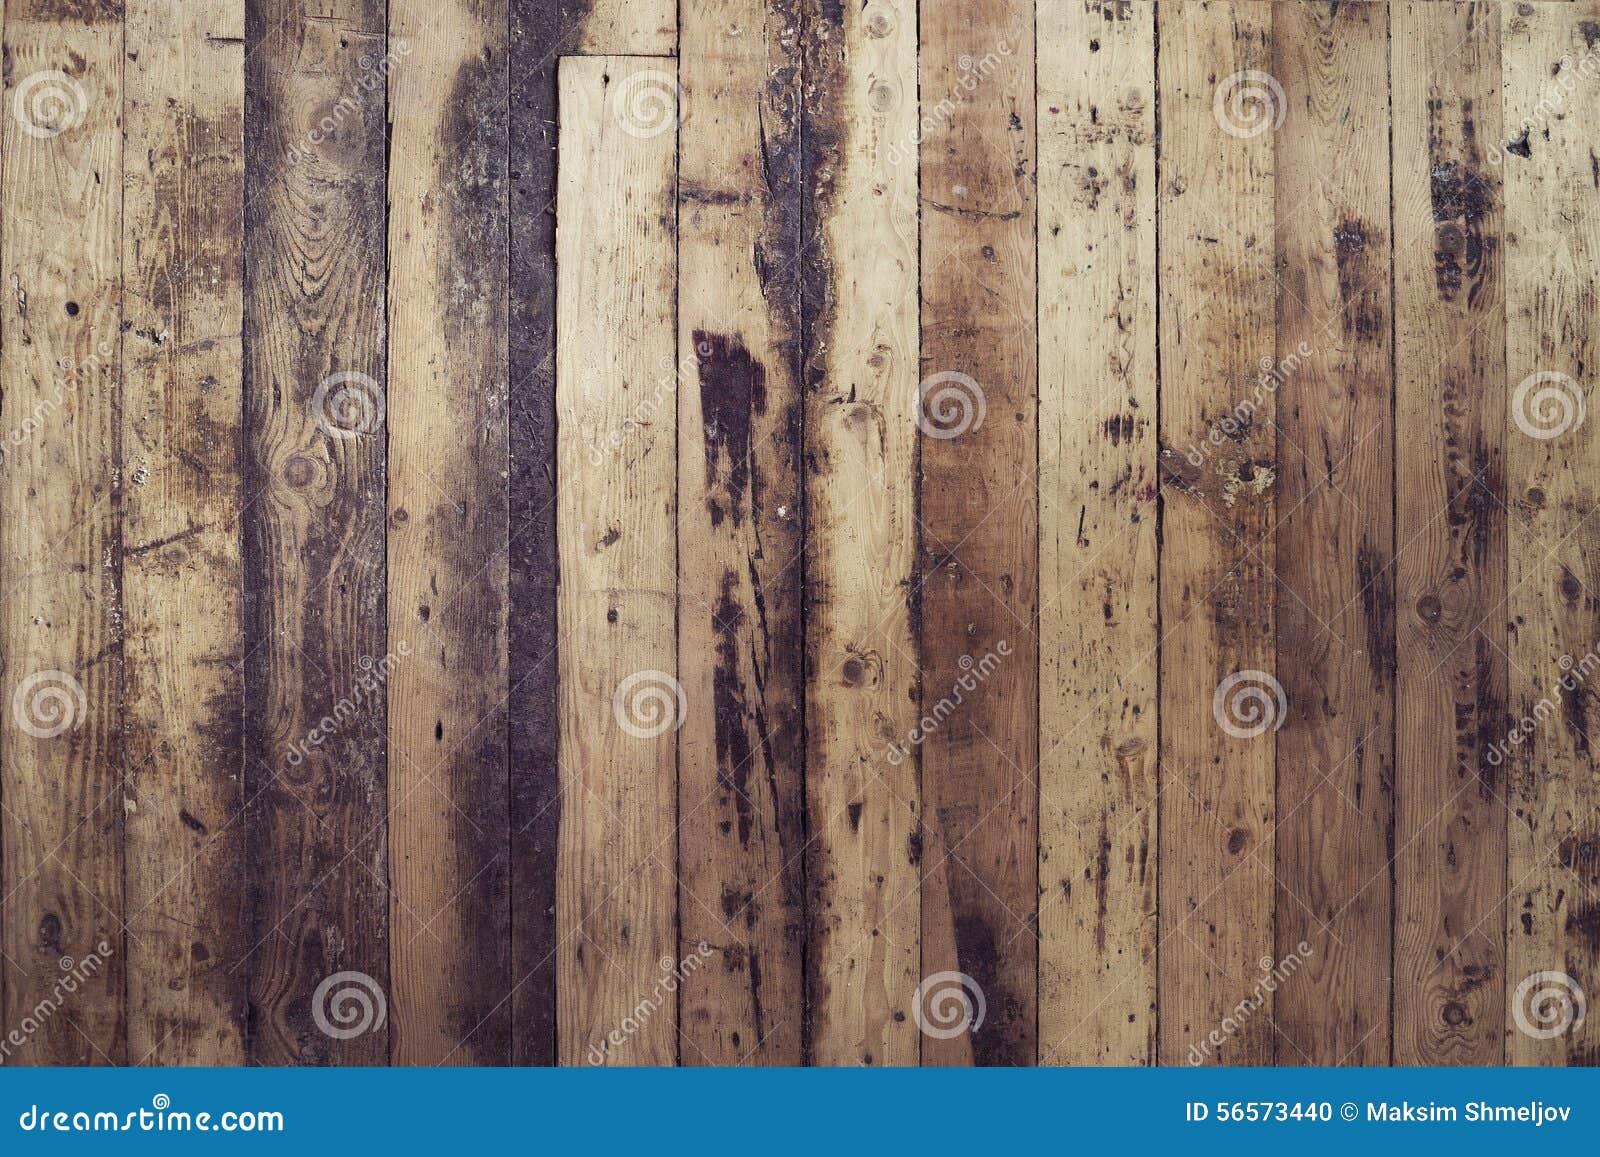 Download Παλαιό και Shabby πάτωμα σύσταση σανίδων ξύλινη Στοκ Εικόνες - εικόνα από ξυλουργική, σανίδα: 56573440